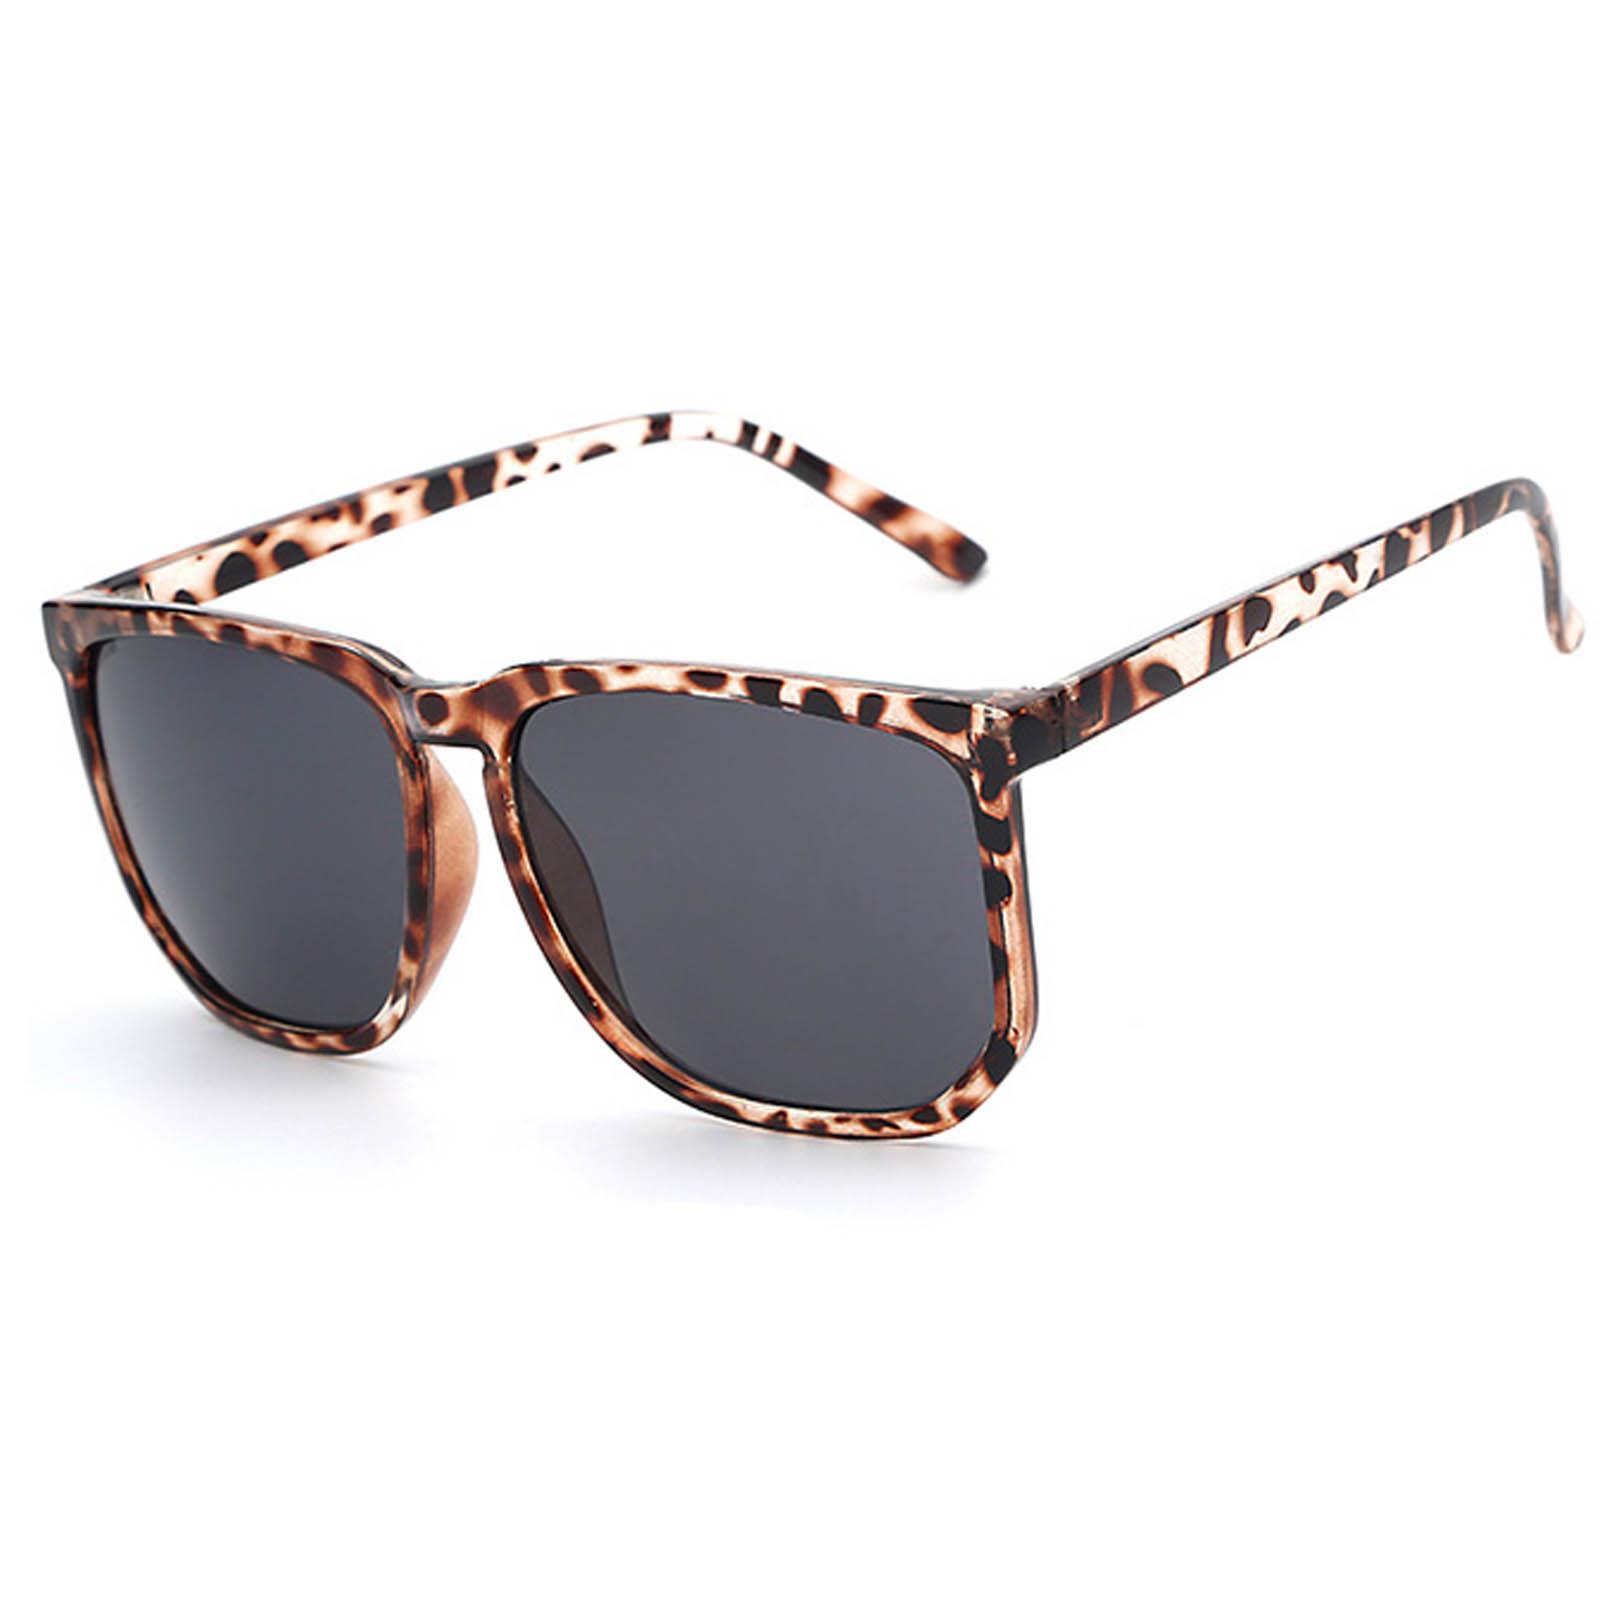 9d6e5e44c2 OWL ® 046 C2 Rectangle Eyewear Sunglasses Women s Men s Metal Leopard Frame  Black Lens One Pair